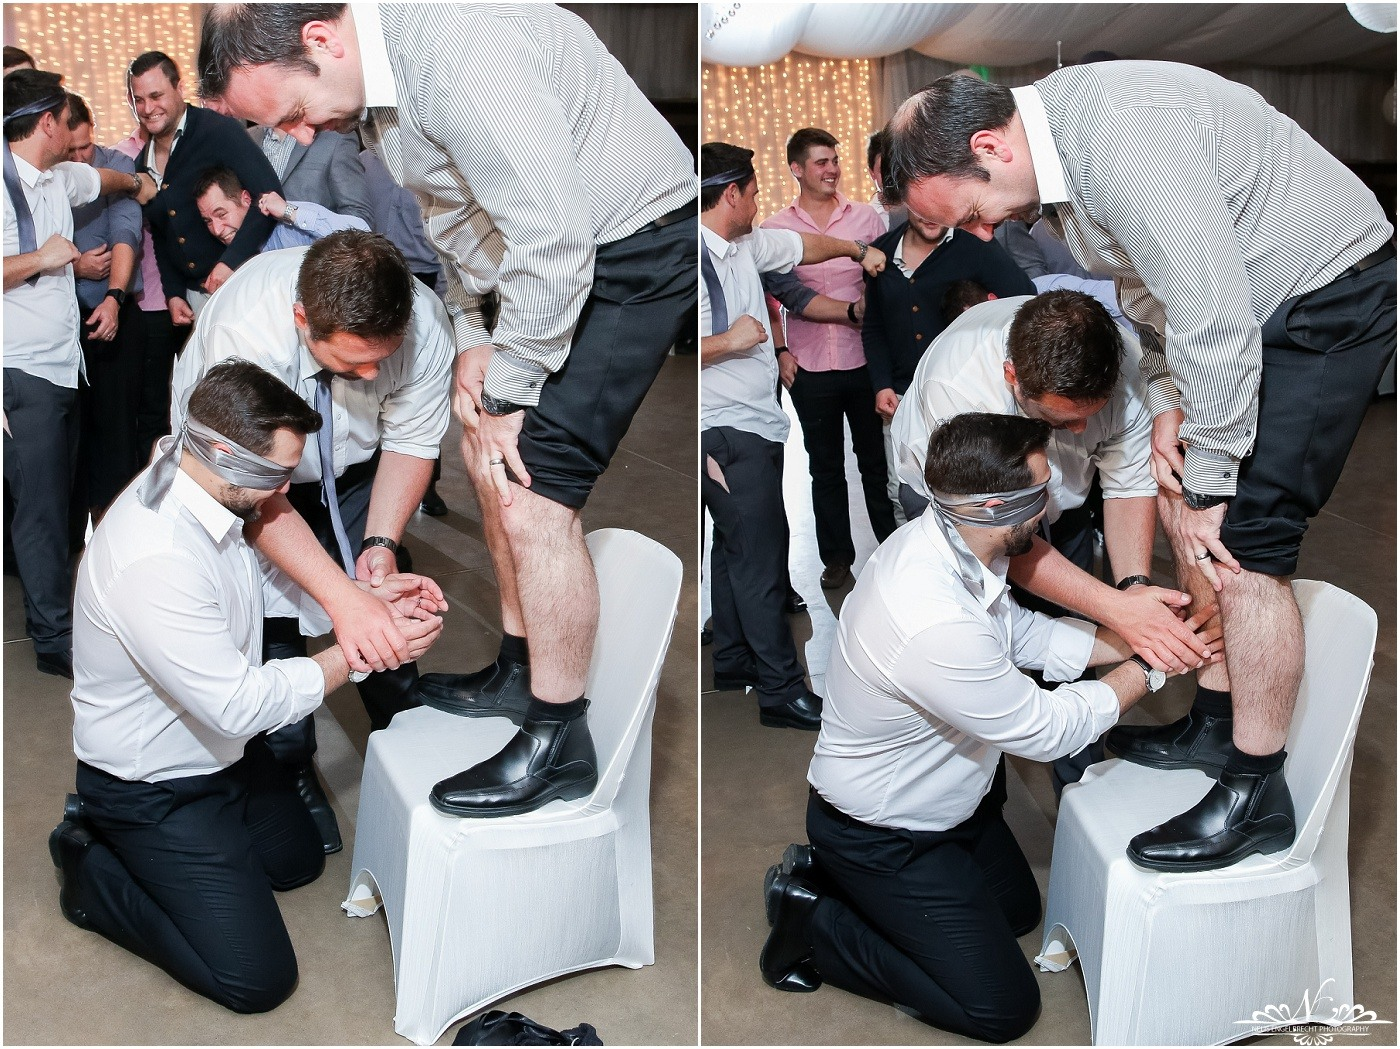 Eensgezind-Wedding-Photos-Nelis-Engelbrecht-Photography-213